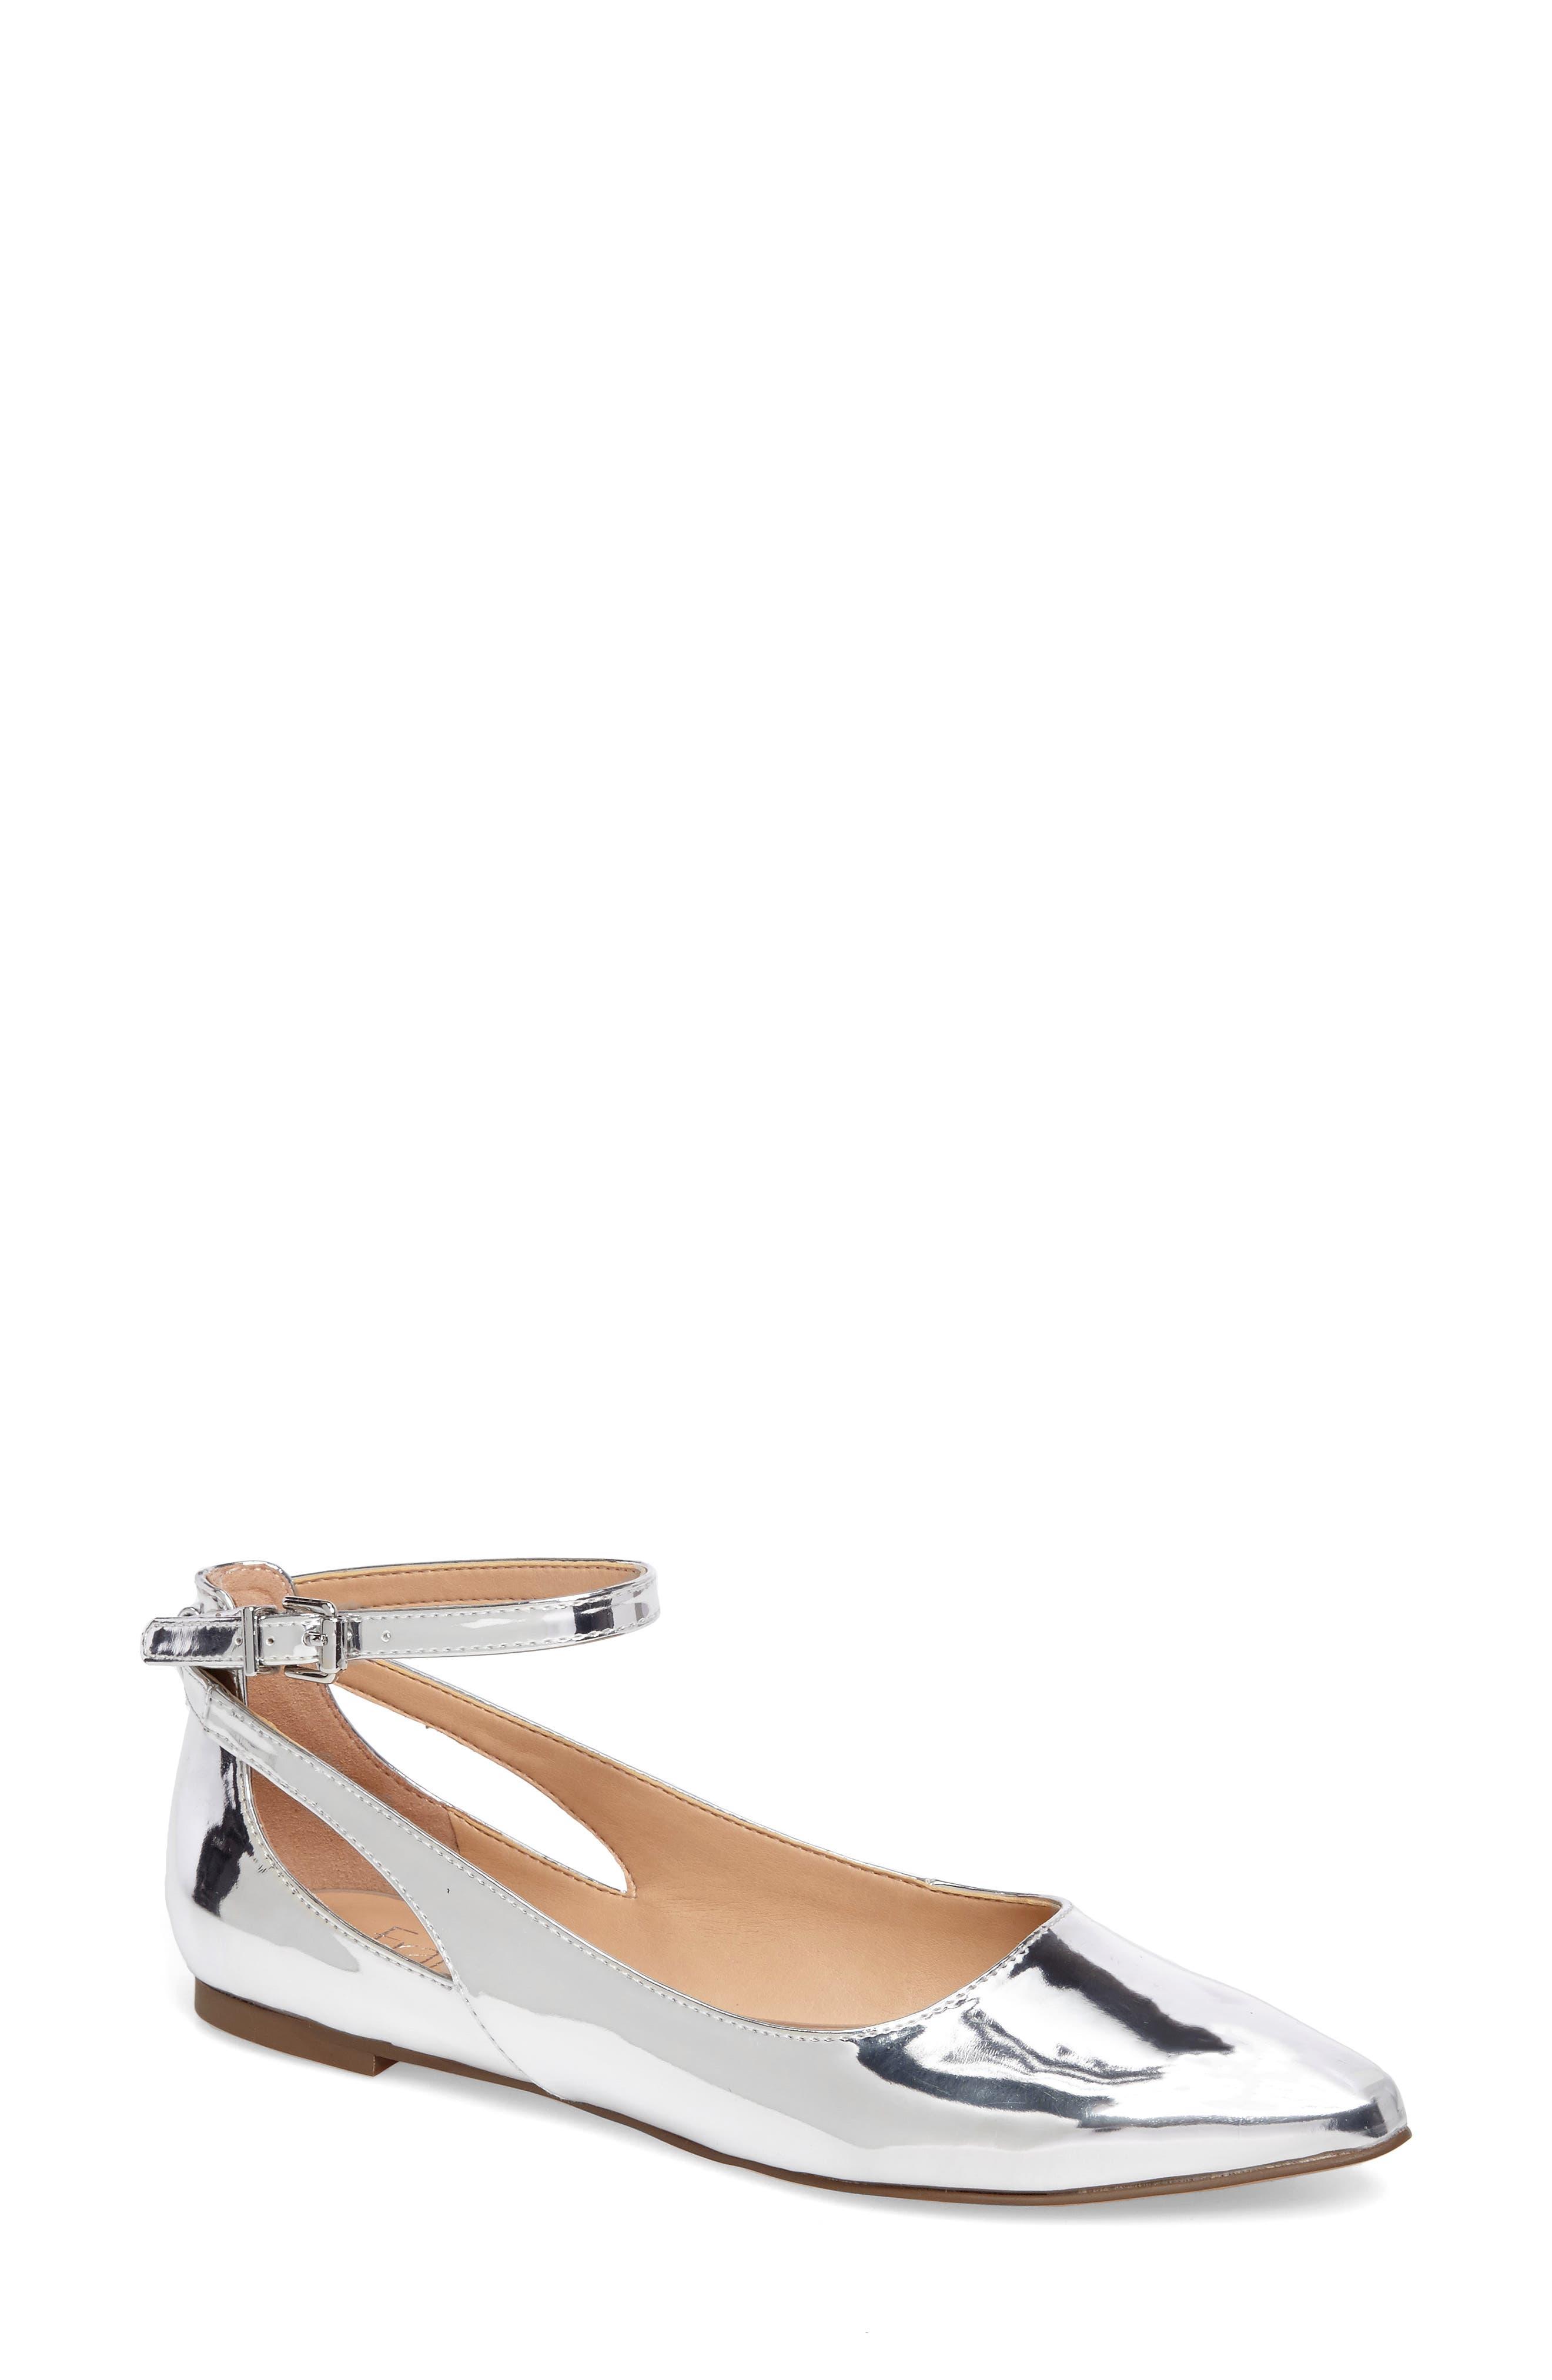 Sylvia Ankle Strap Flat,                             Main thumbnail 1, color,                             040